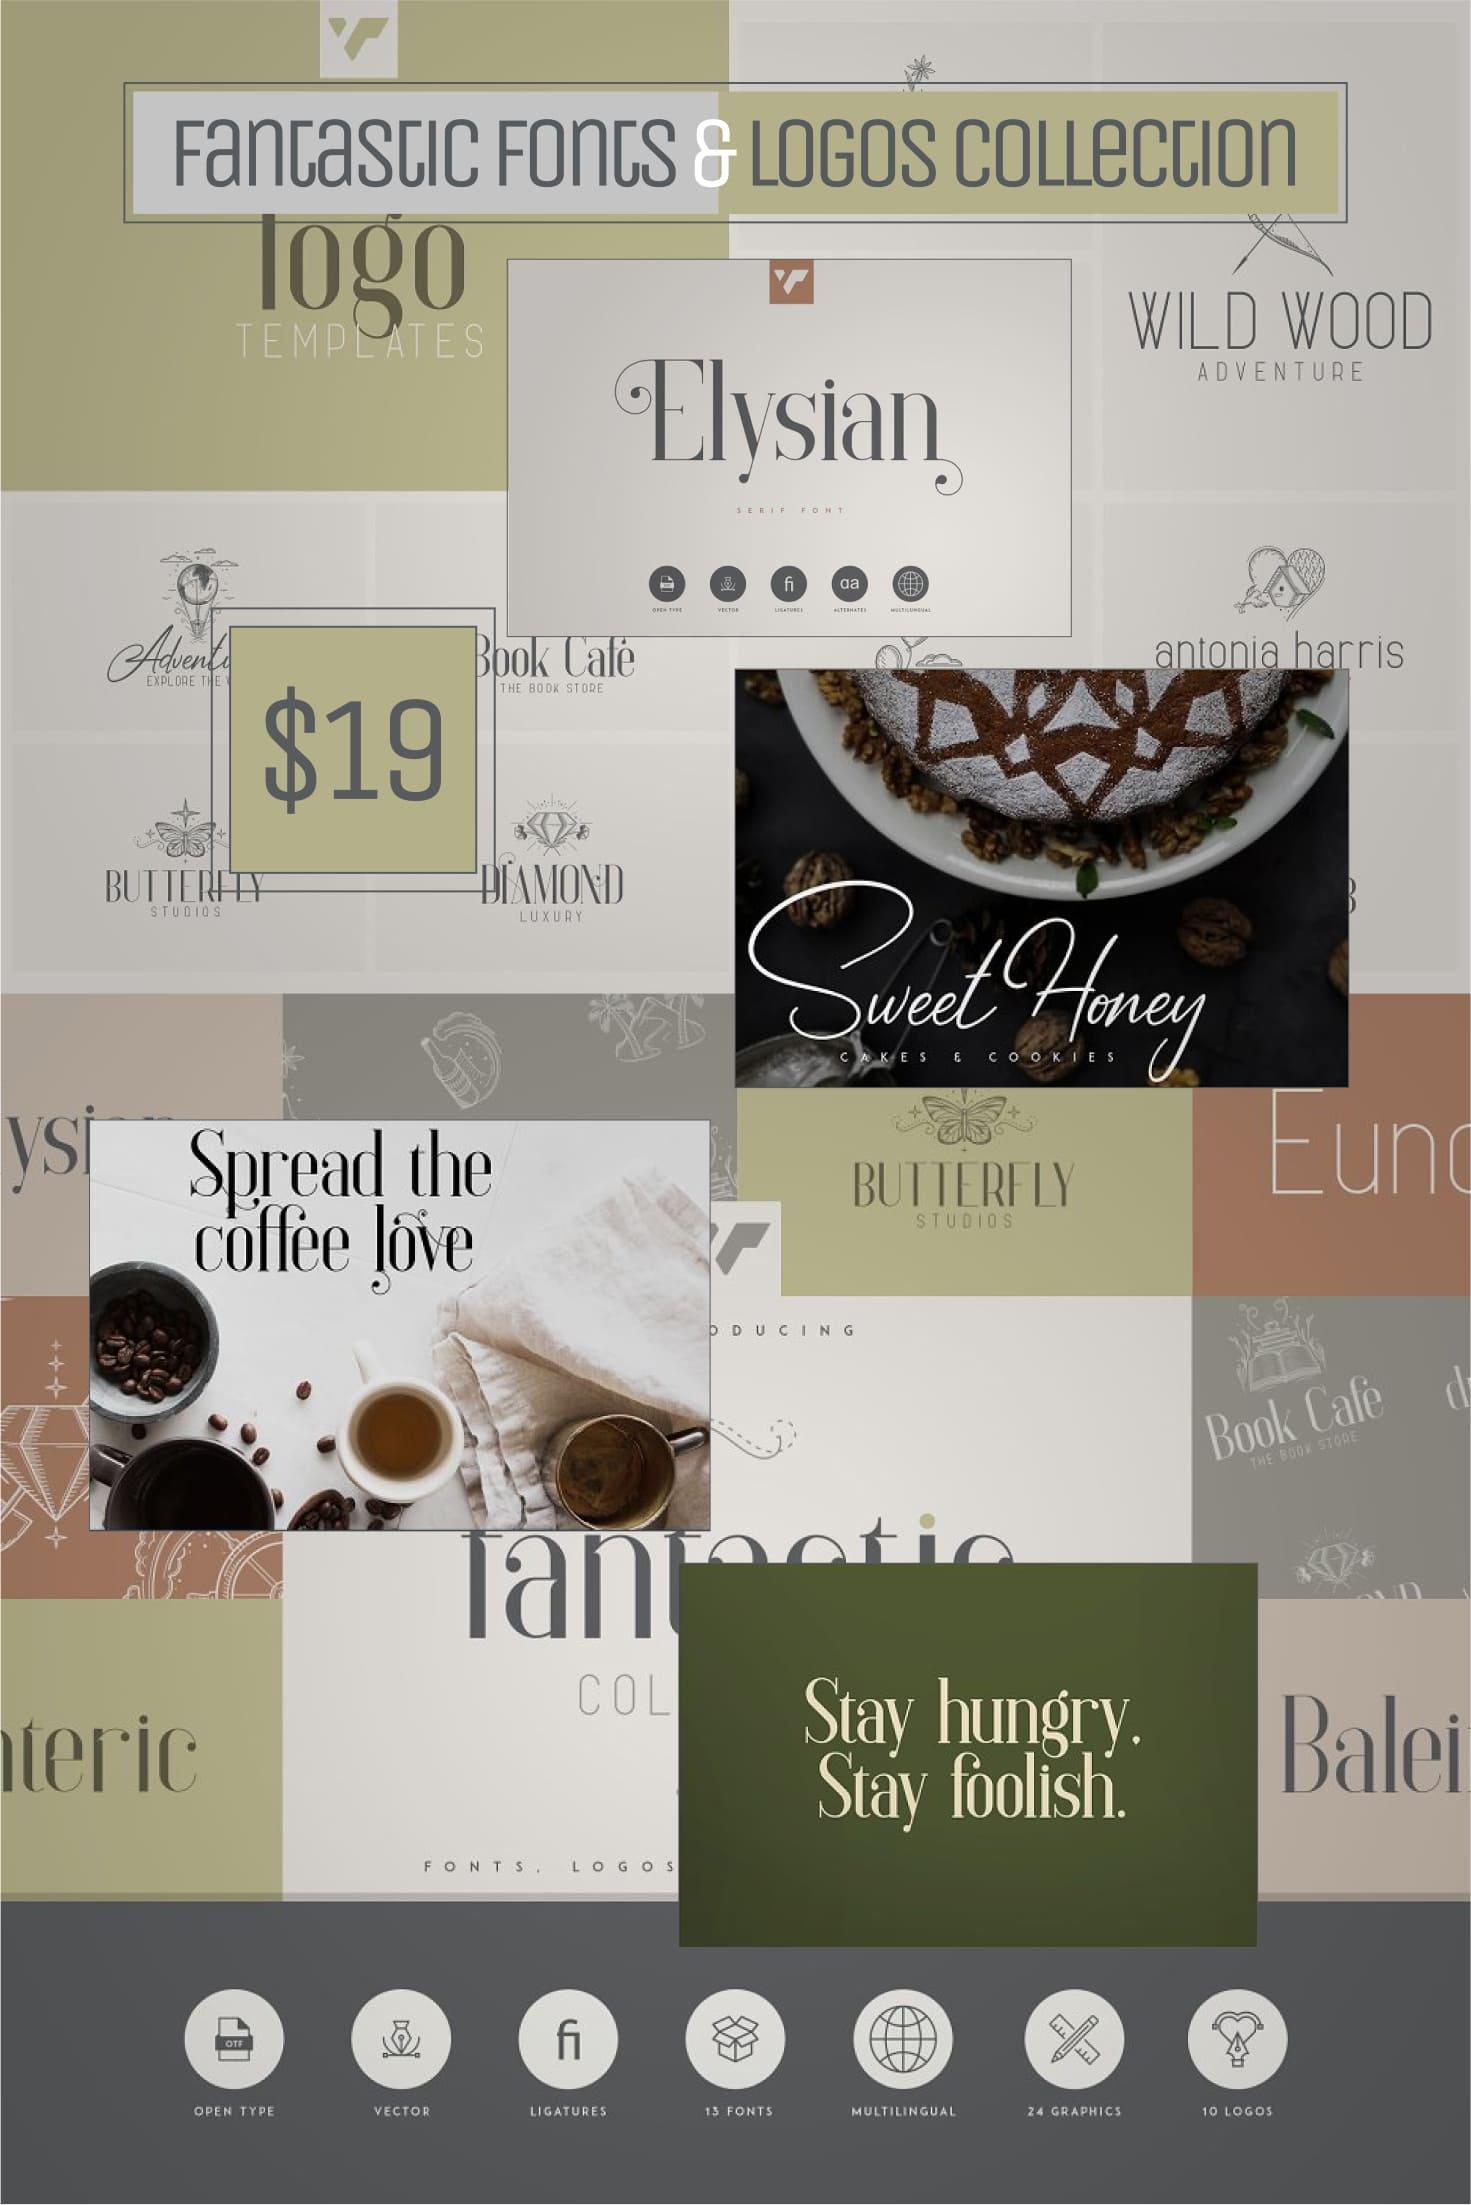 Pinterest Image: Fantastic Fonts & Logos Collection.